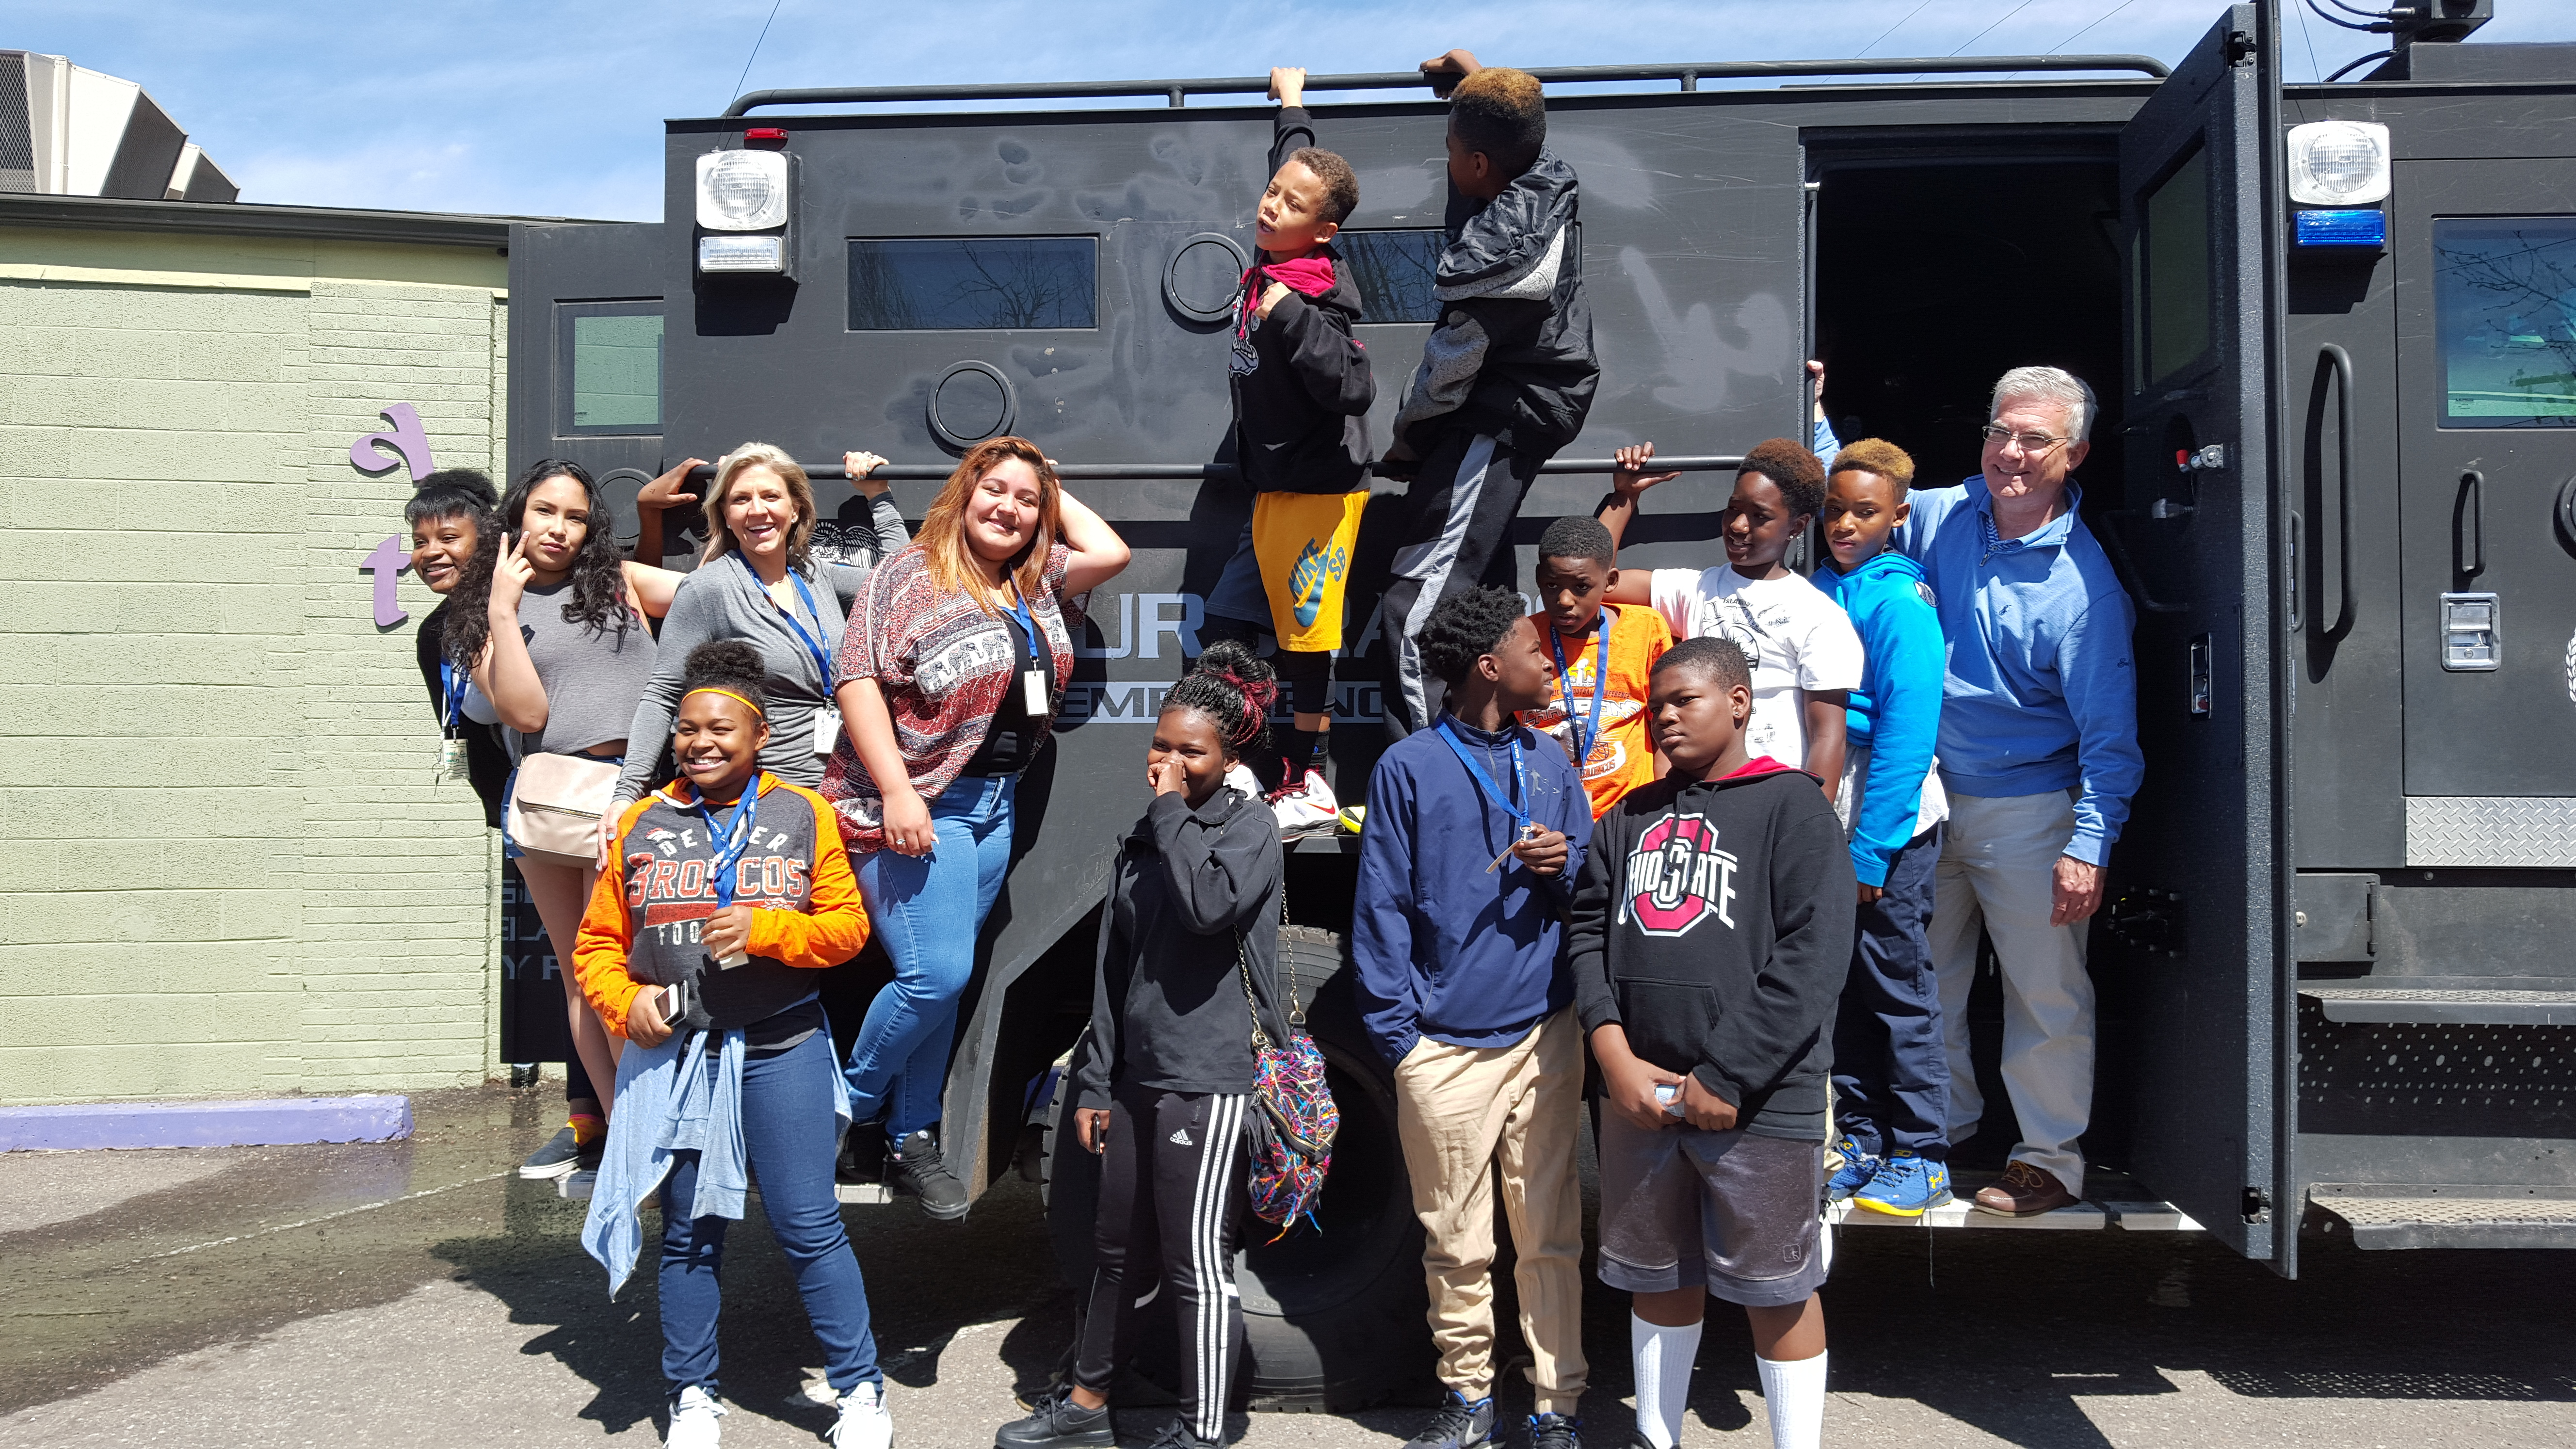 Kids_with_APD_vehicle_The_Bear.jpg